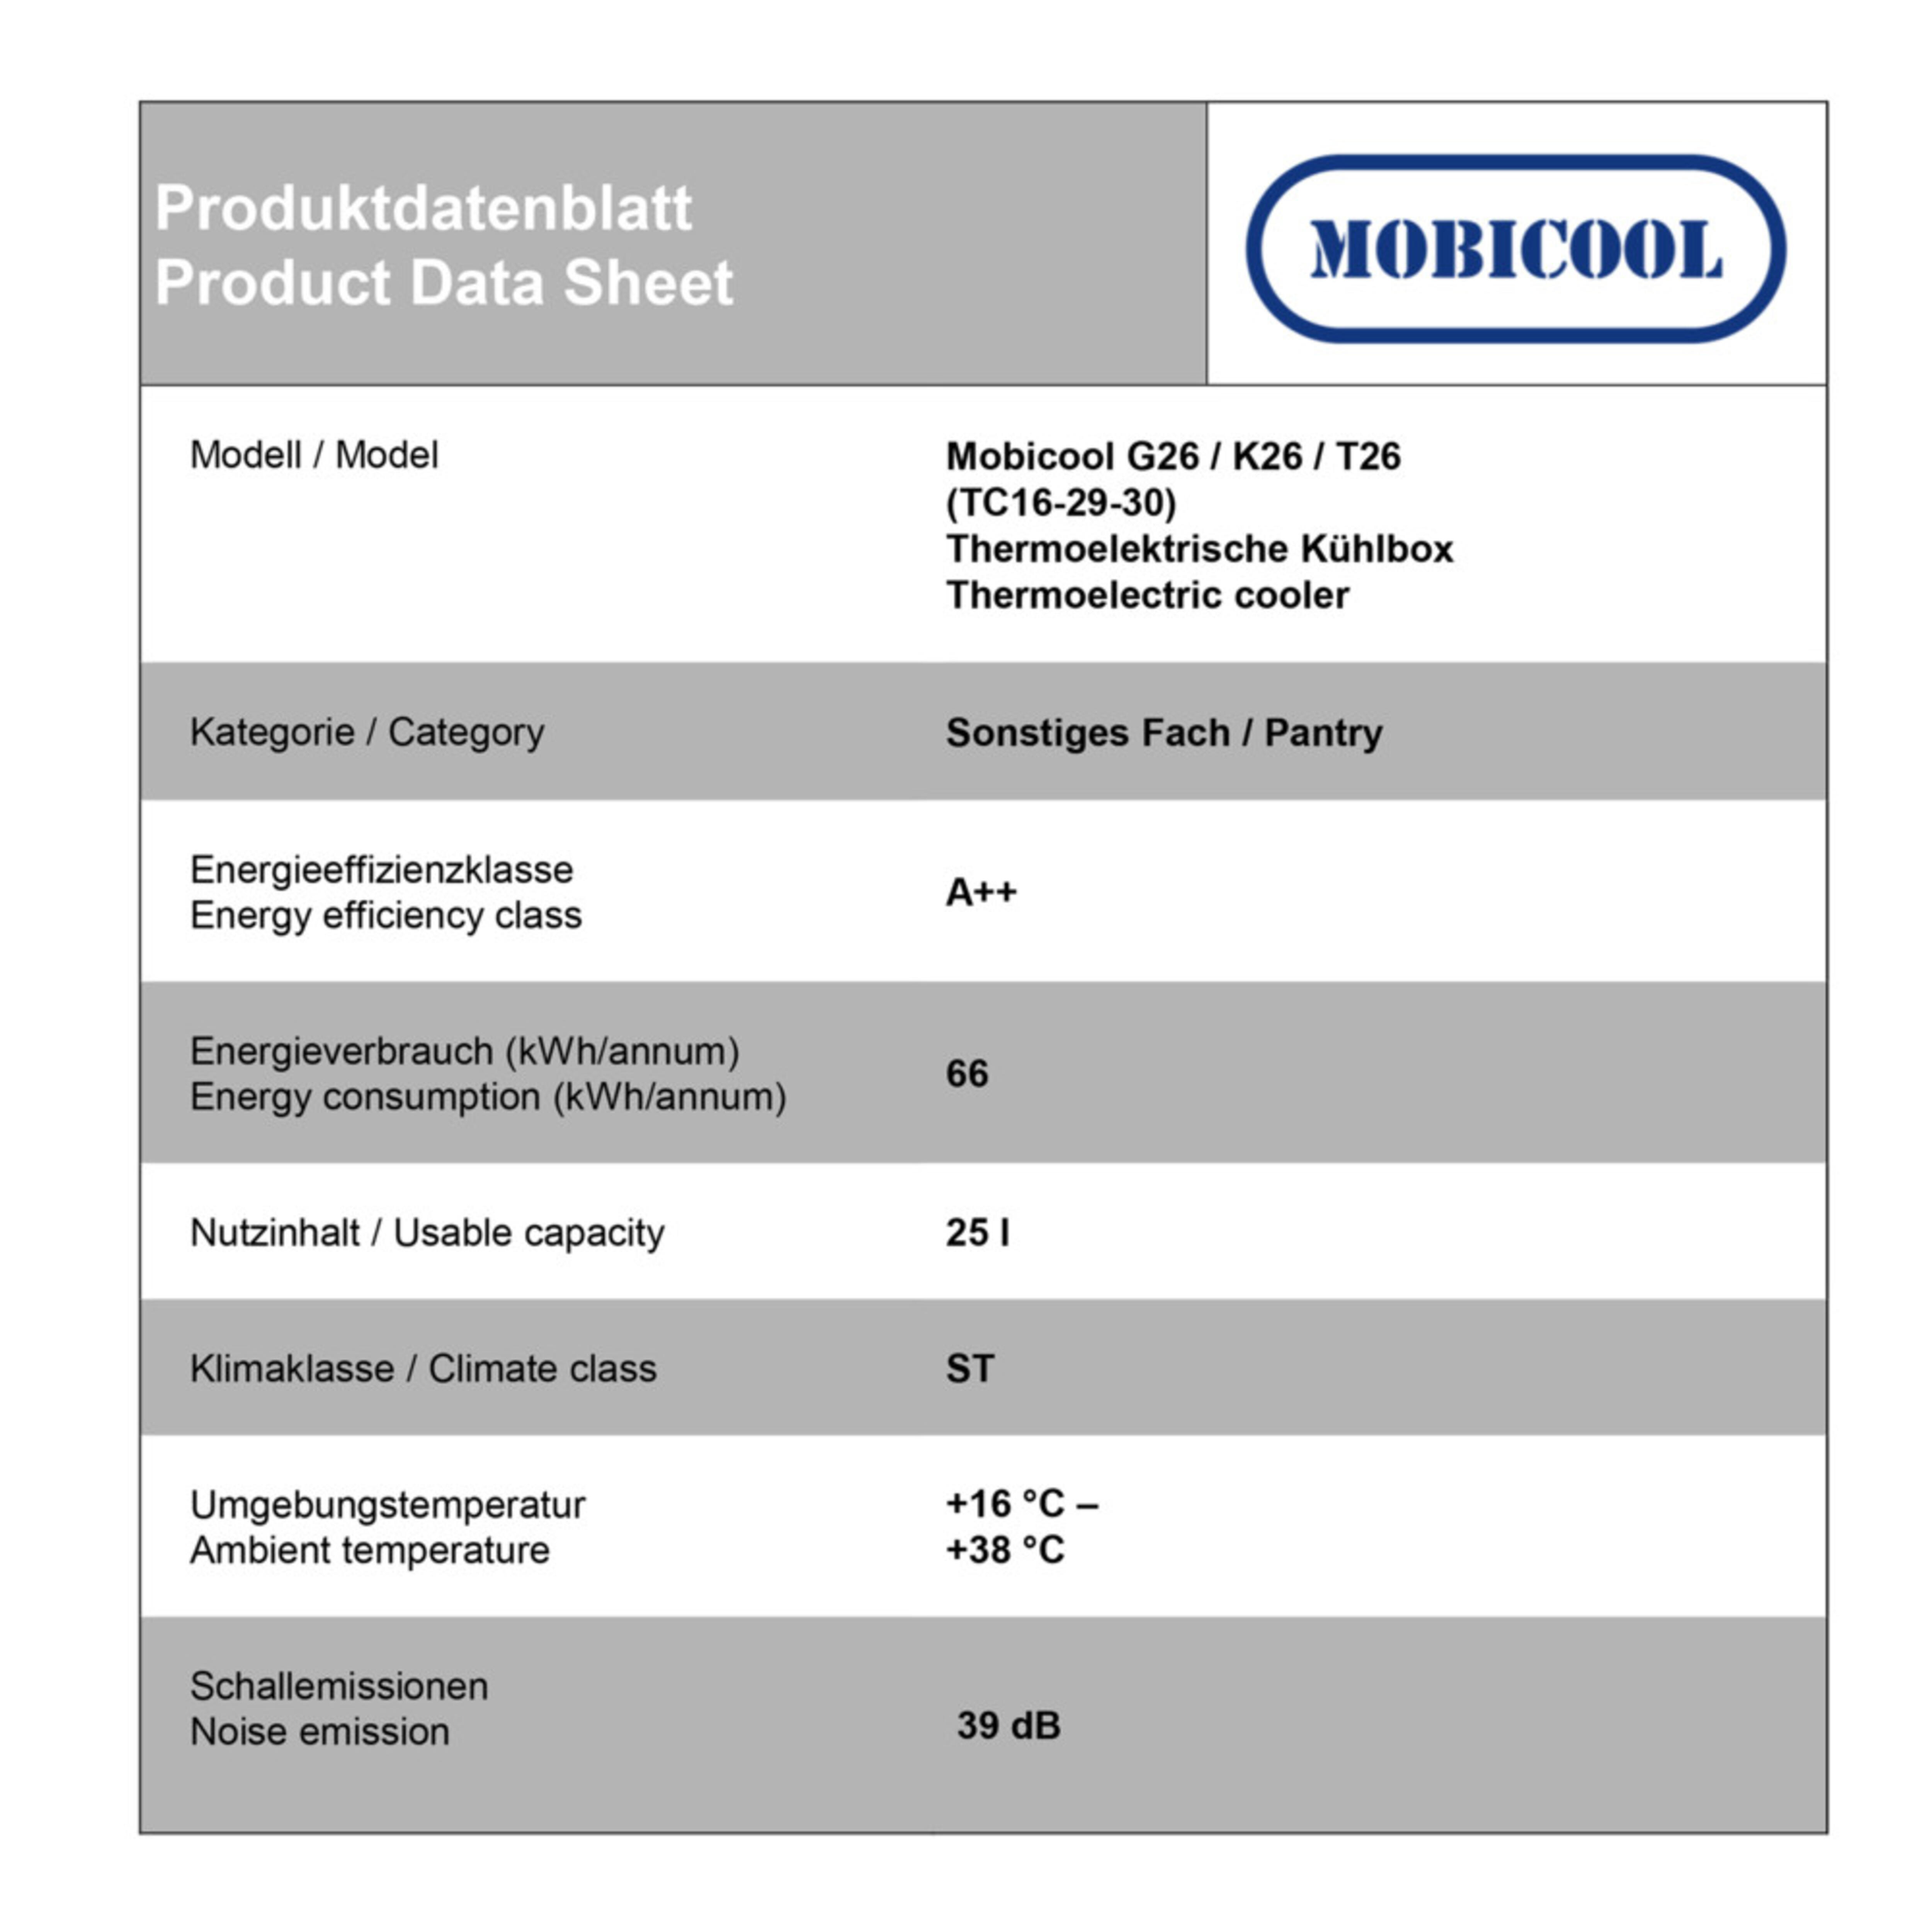 Mobicool T26 AC/DC Energy data sheet